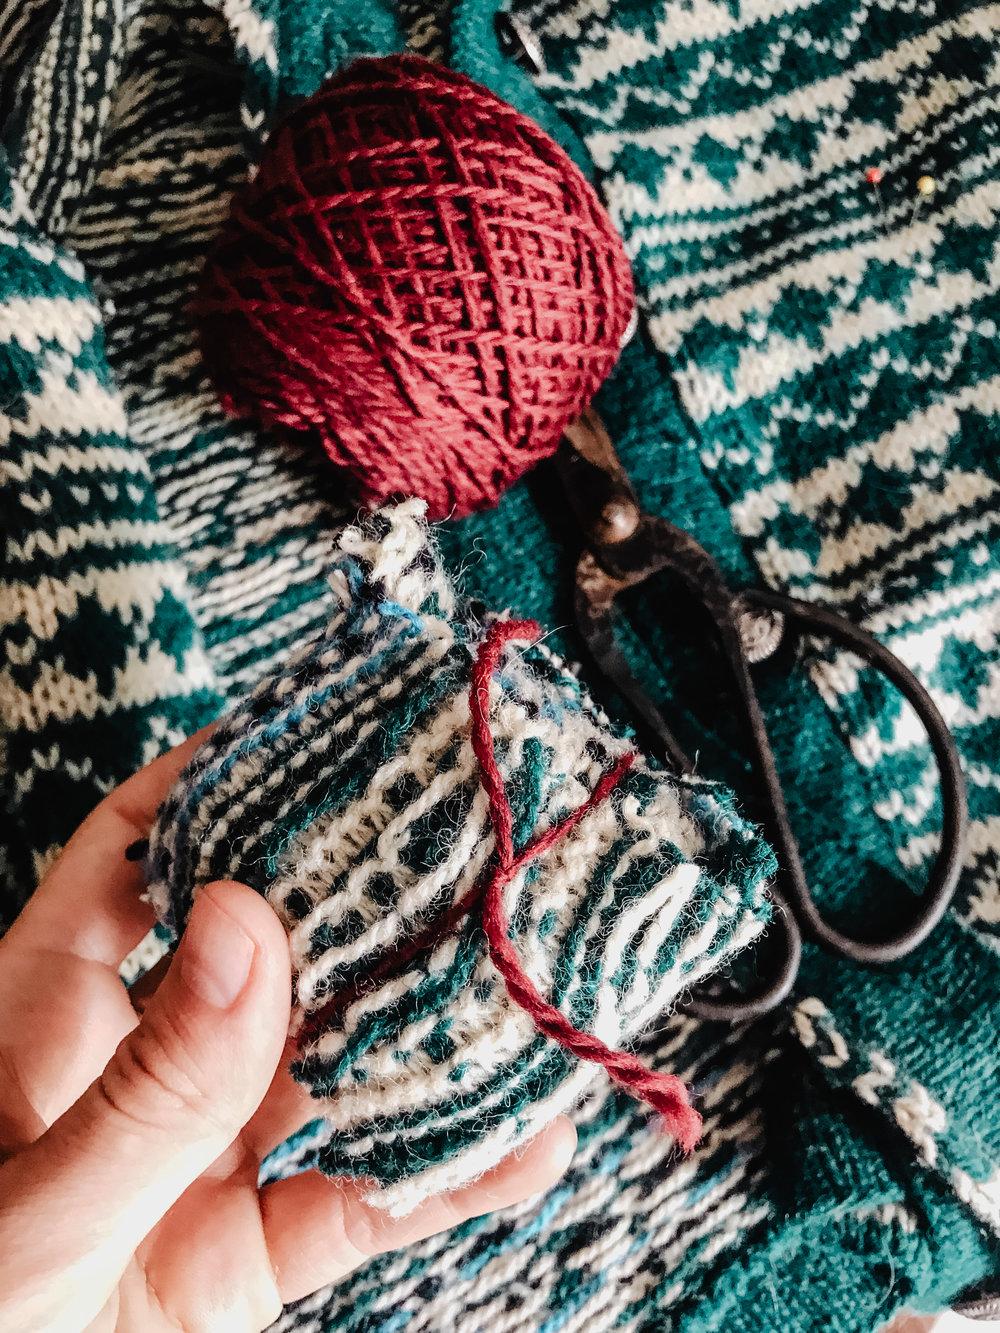 3. Bind the wool ball with the wool yarn.